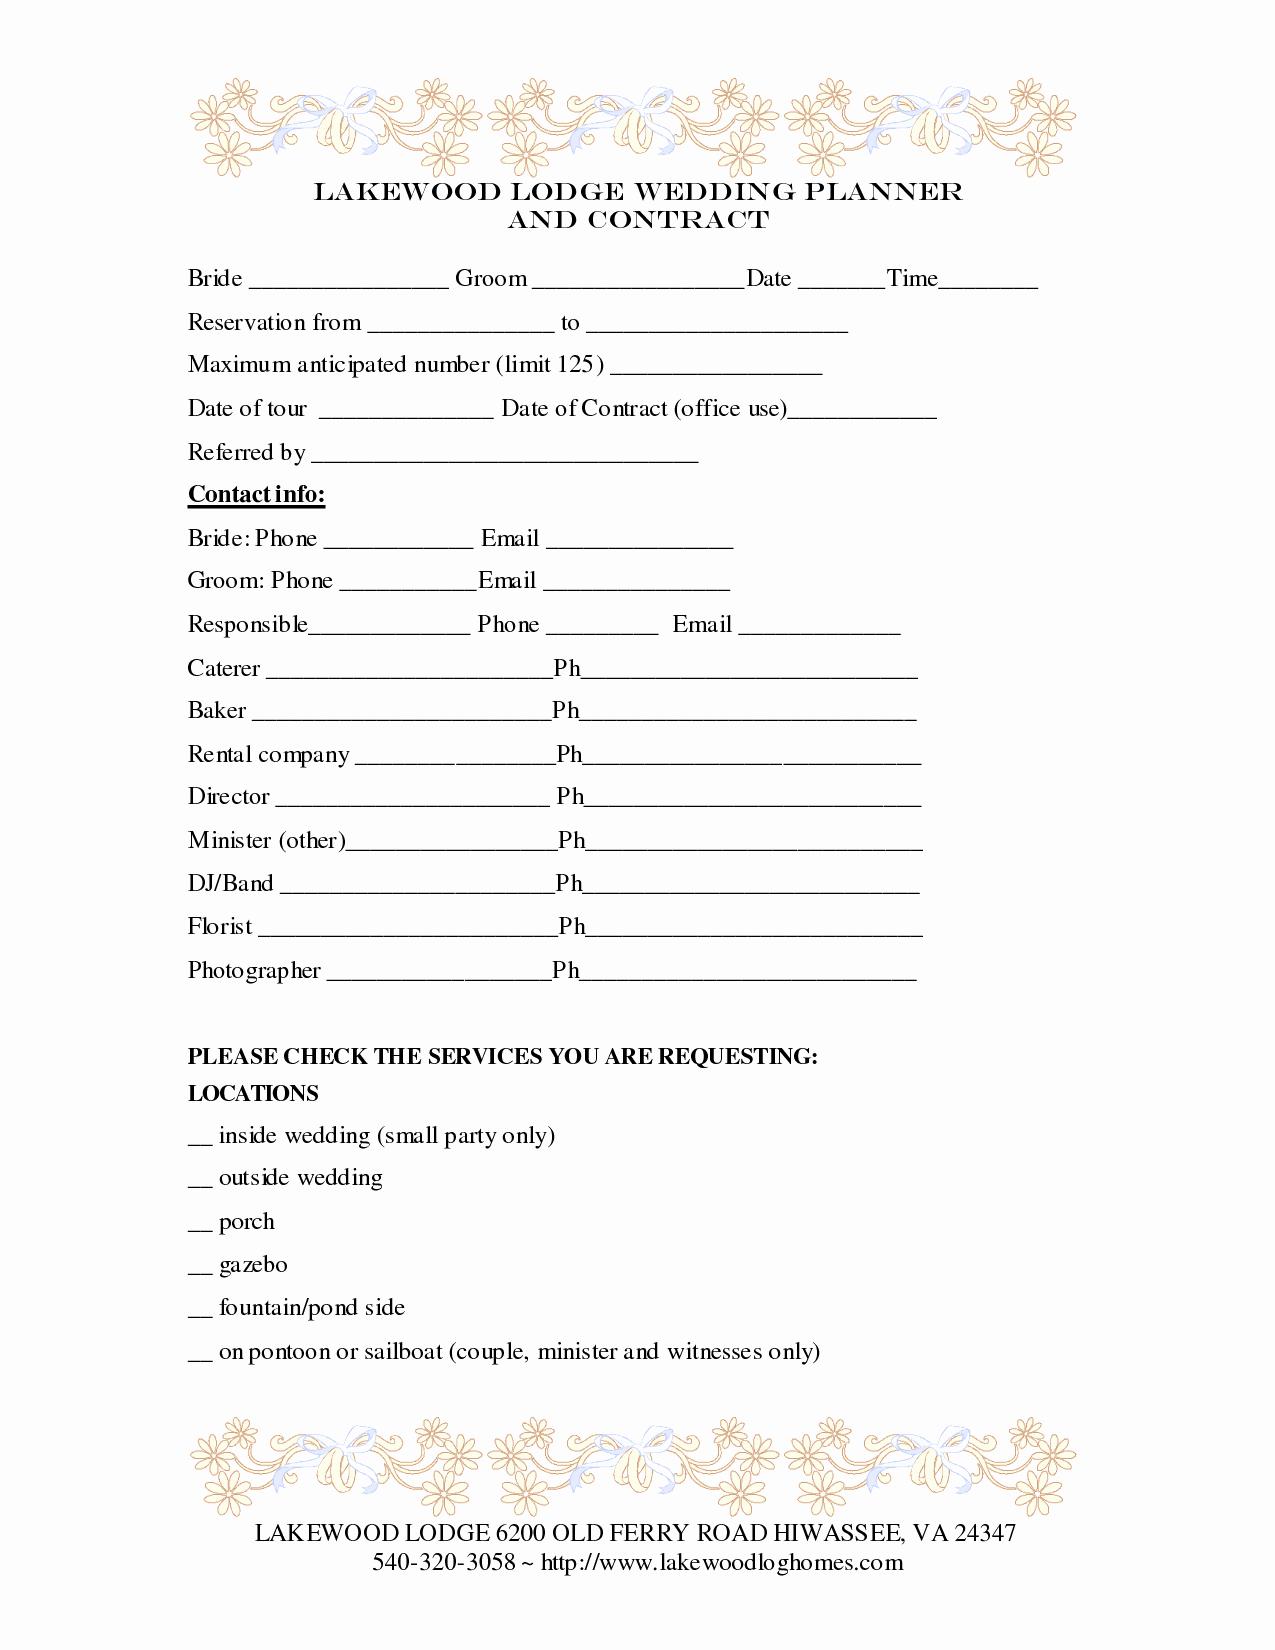 Wedding Planner Contract Template Elegant Wedding Planner Contract Template